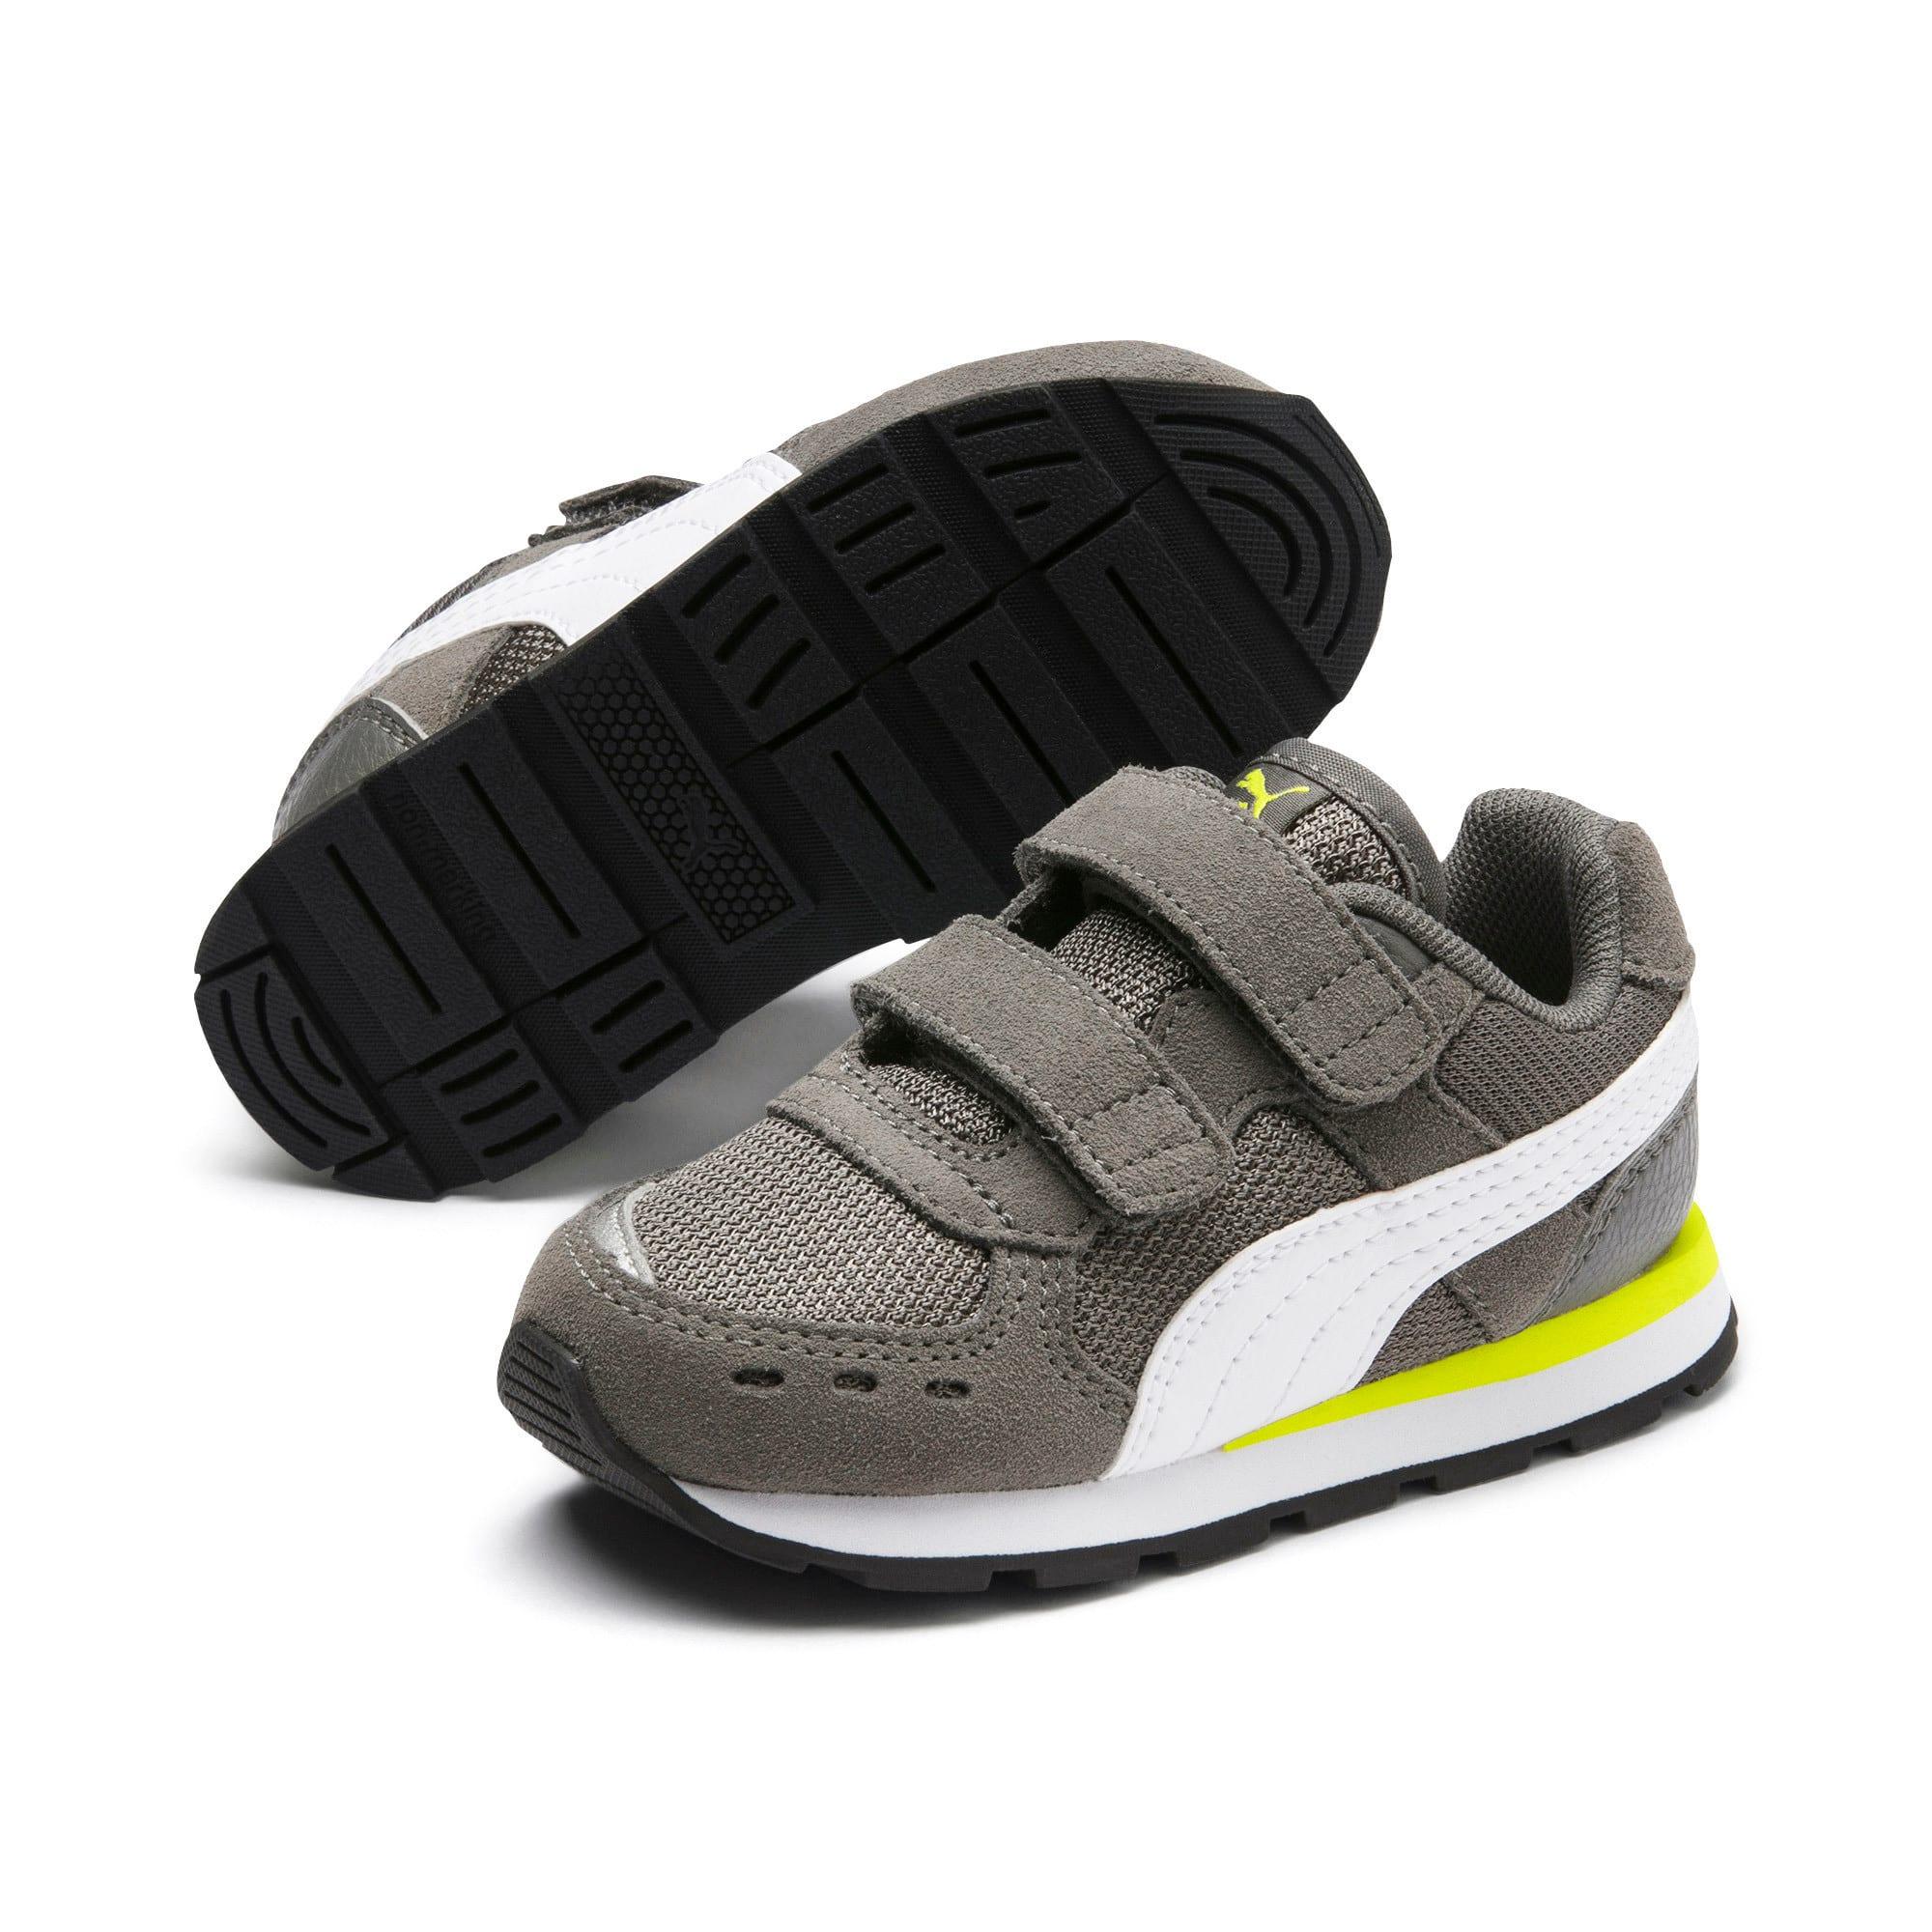 Miniatura 2 de Zapatos Vista para bebé, CASTLEROCK-Puma White, mediano